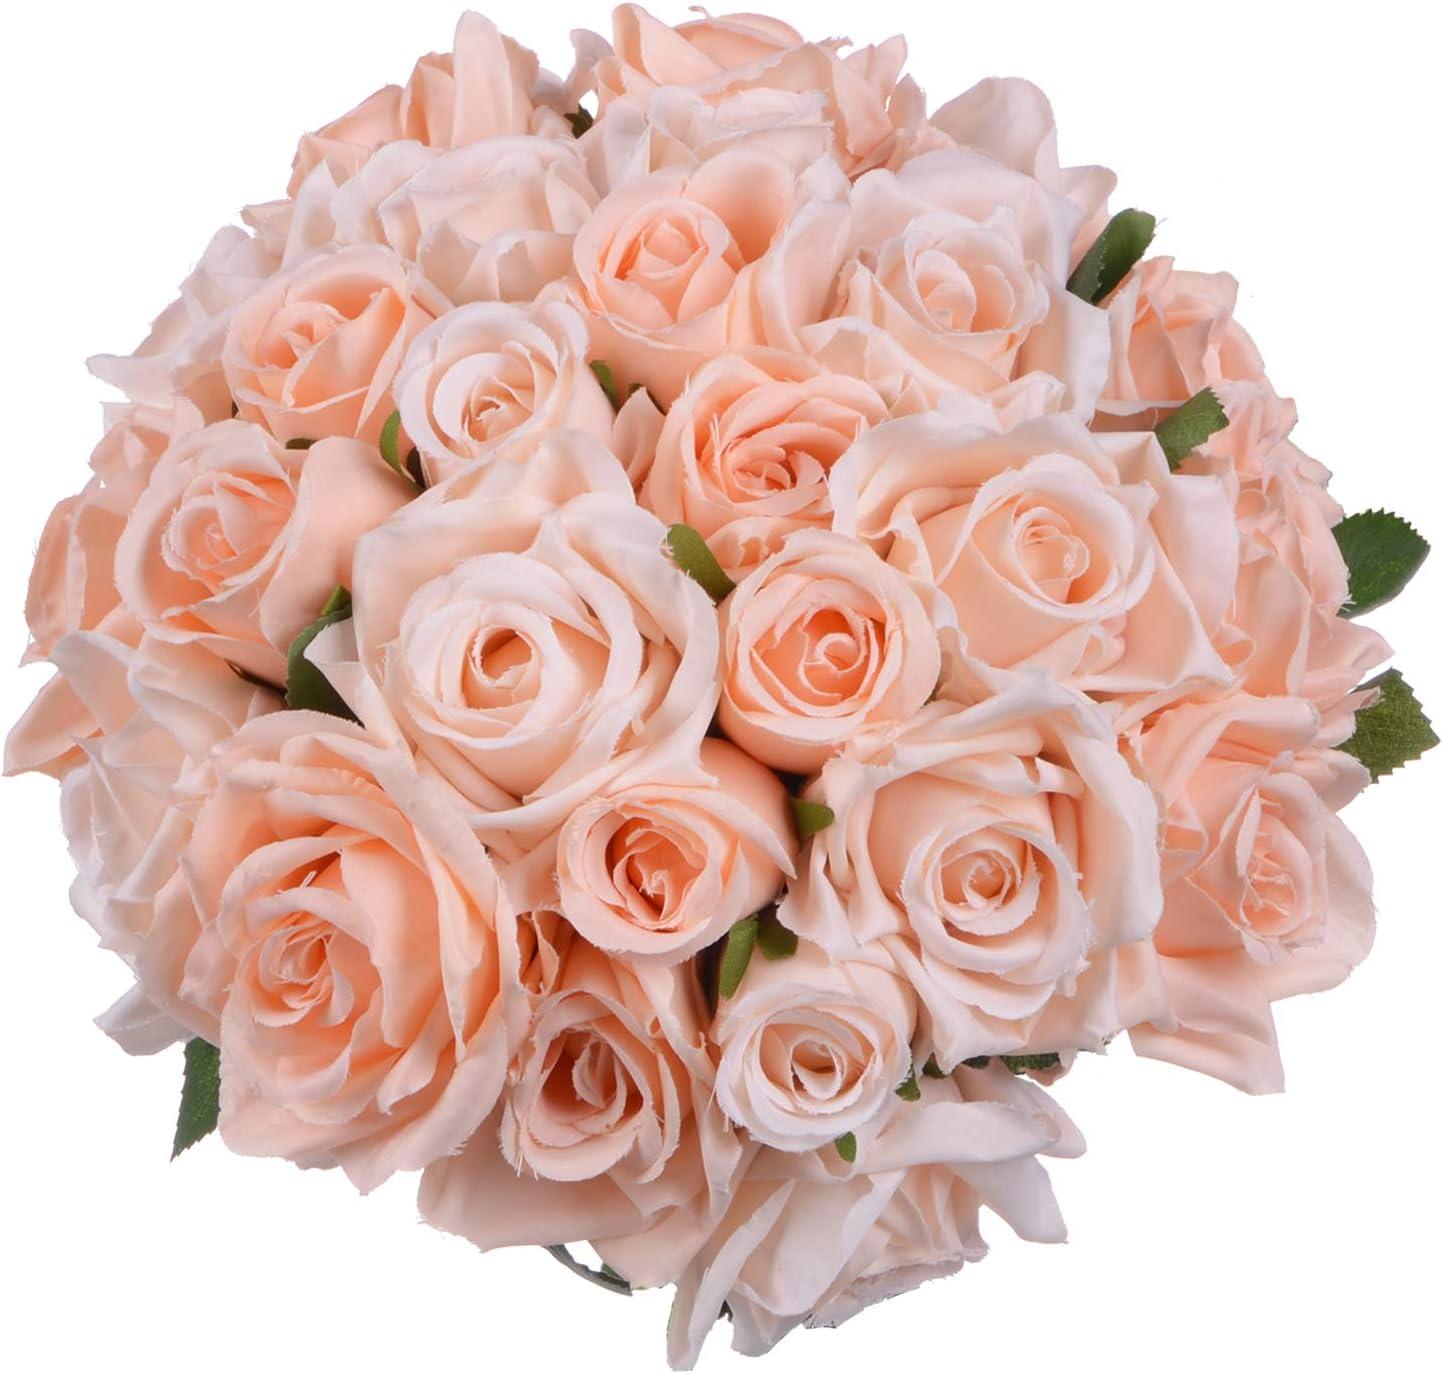 Artificial Flowers Silk Hydrangea Bridal Wedding Bouquet Home Garden Fresh Decor